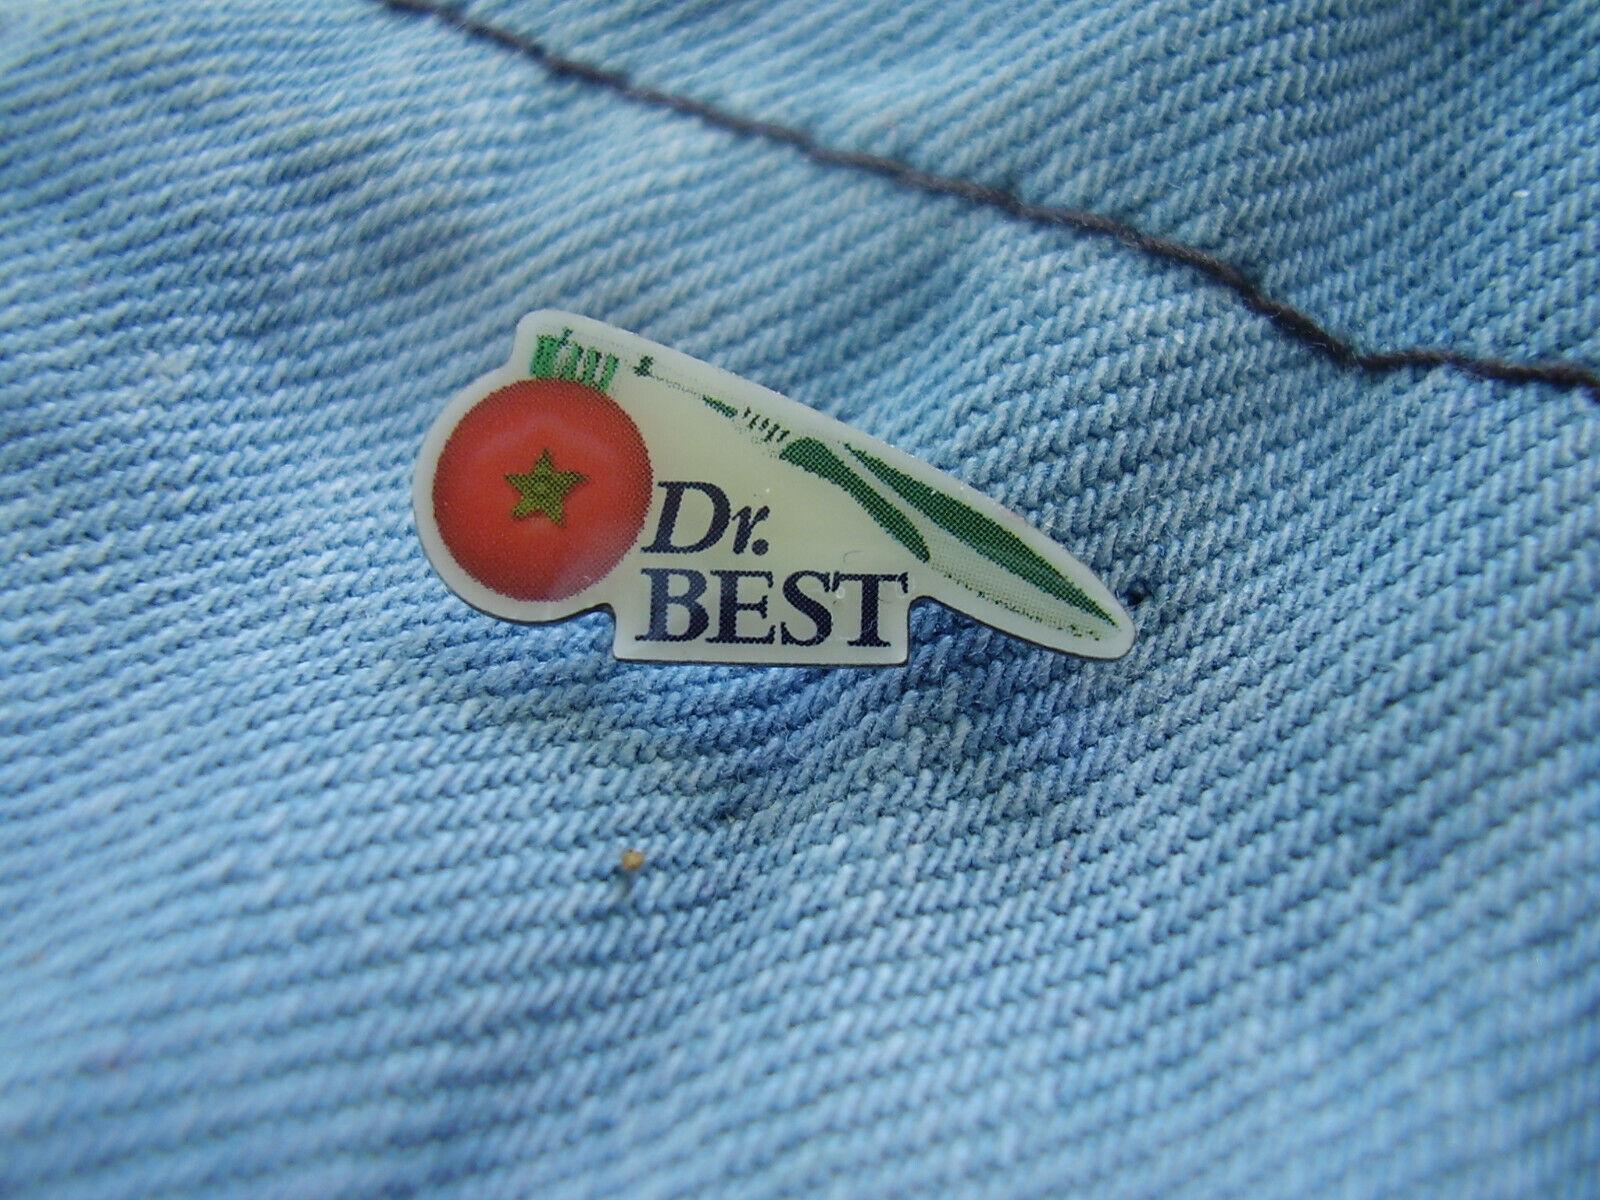 Pin Dr. Best Zahnbürsten Zahnpflege Mundpflege Zahnpflegeprodukte Marke Nr. 1